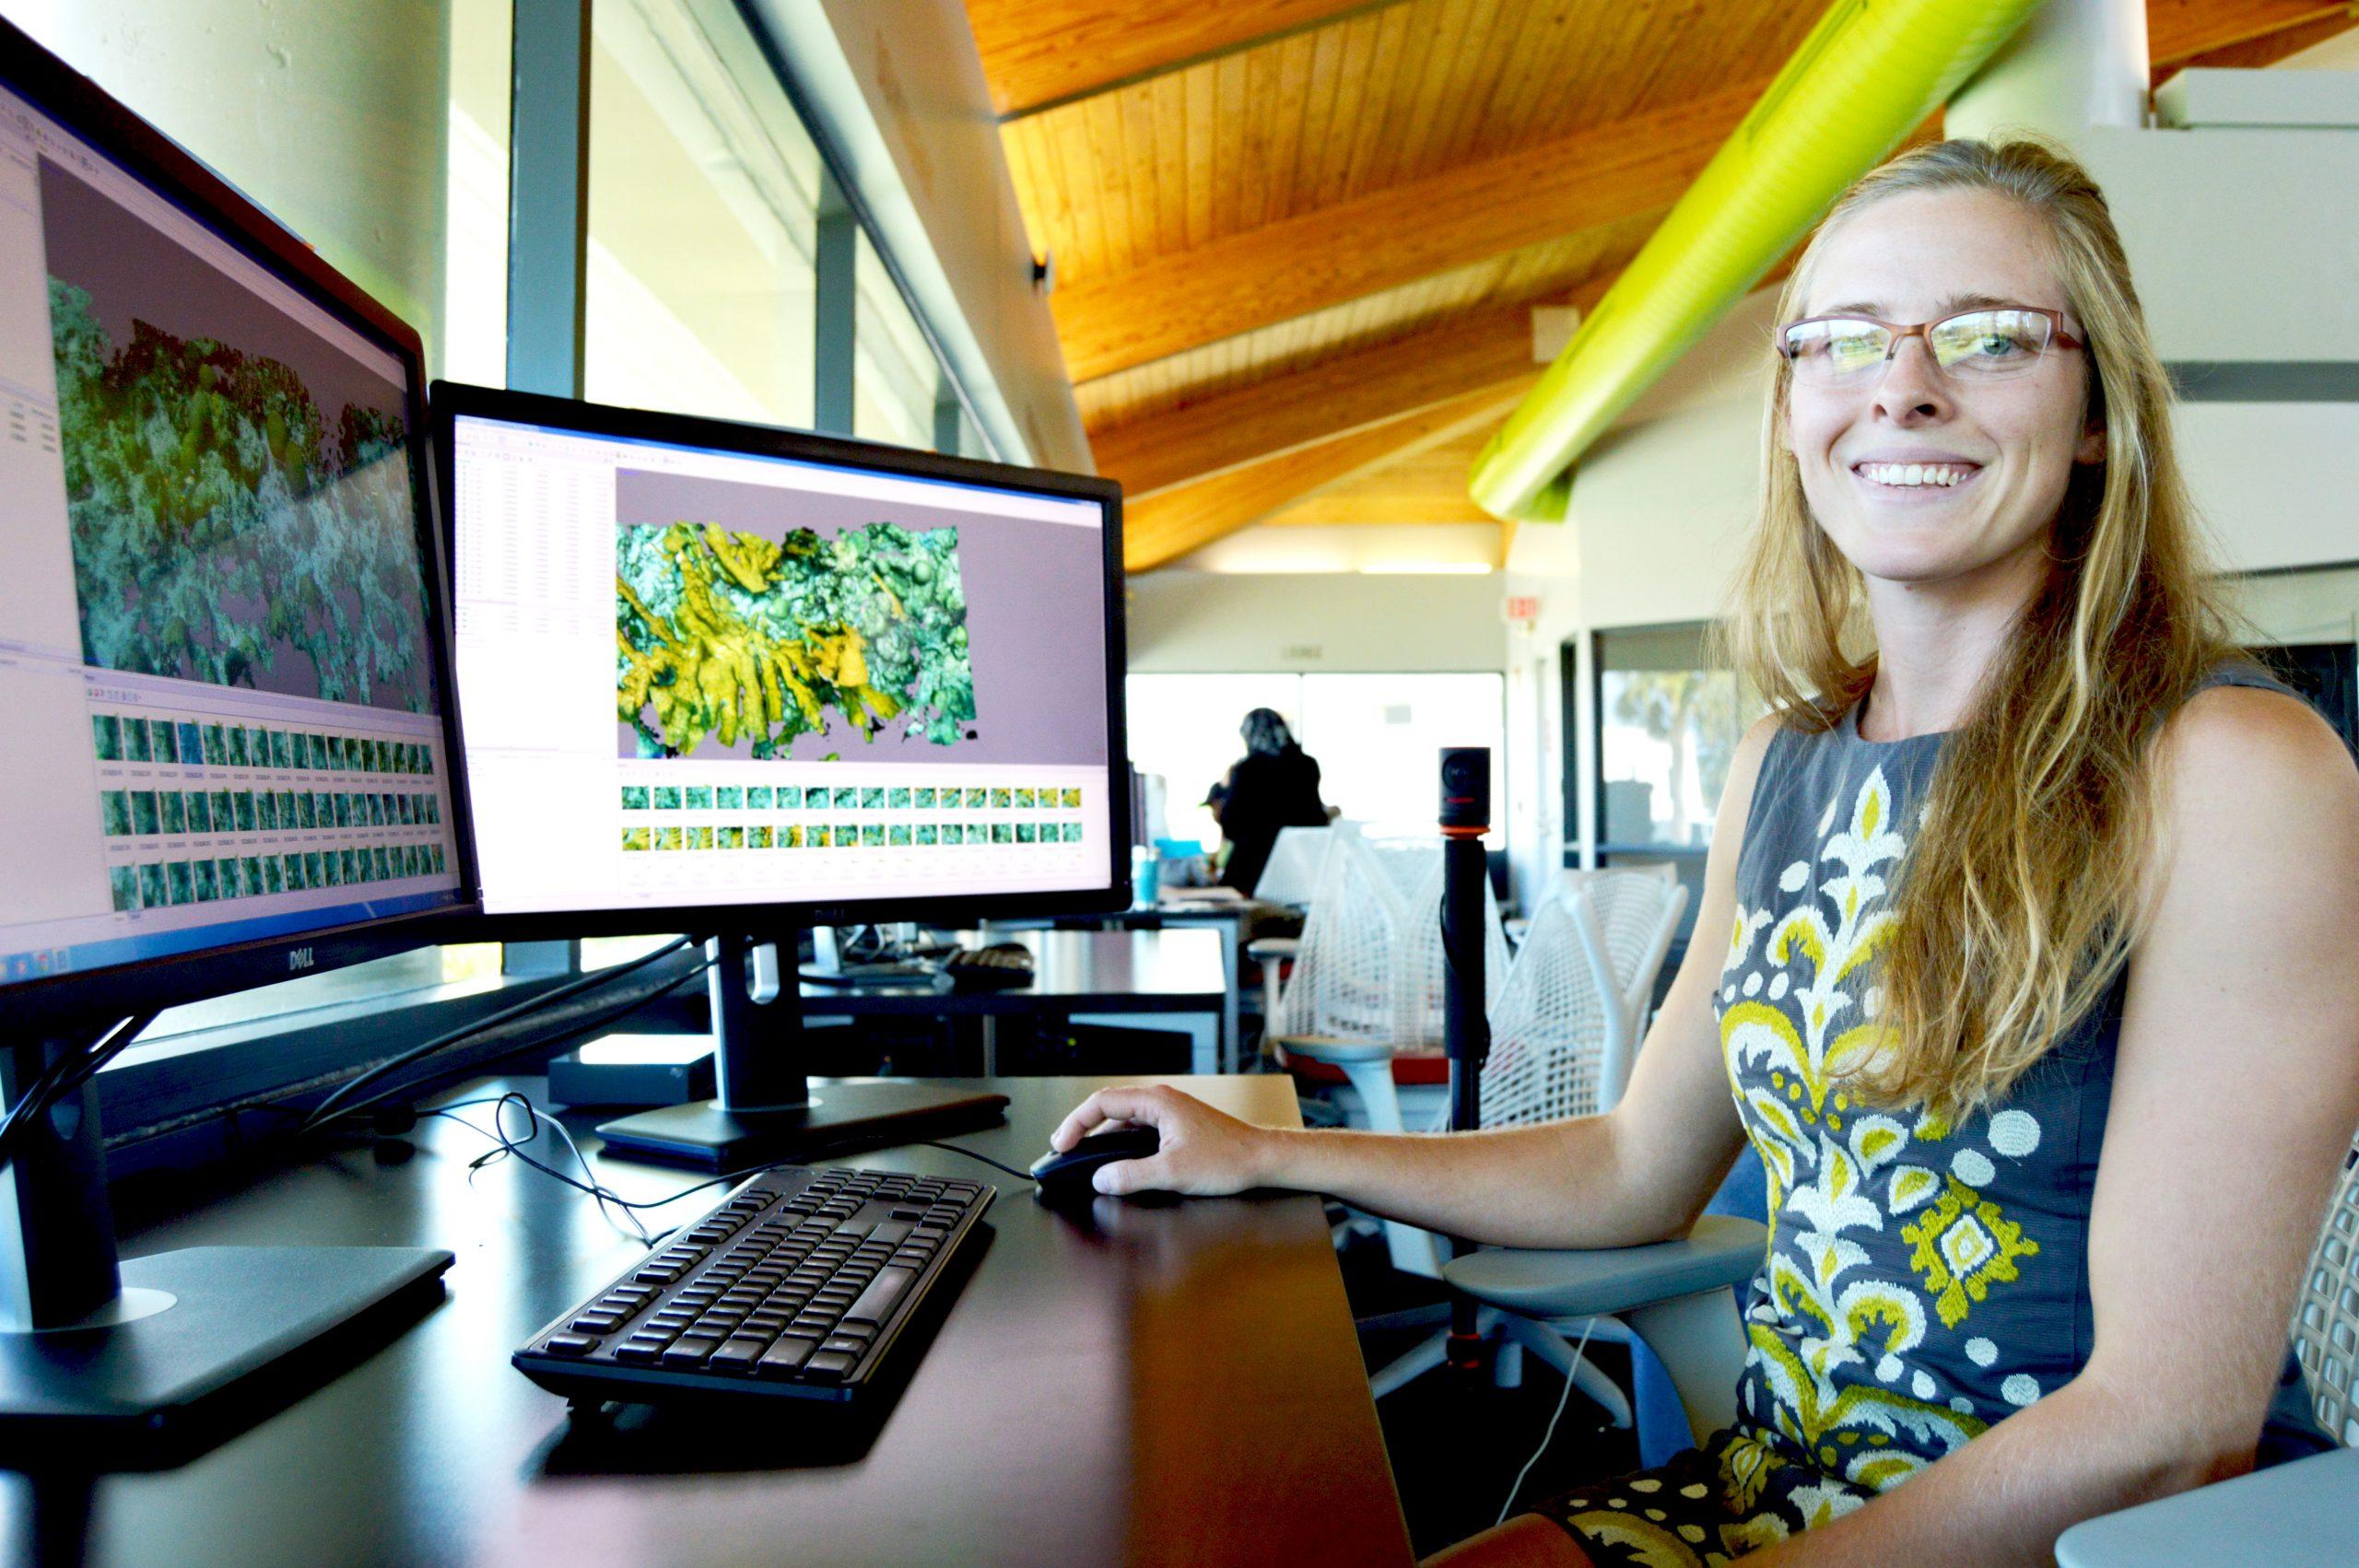 Liz Whitcher, a Florida Tech biological science graduate student